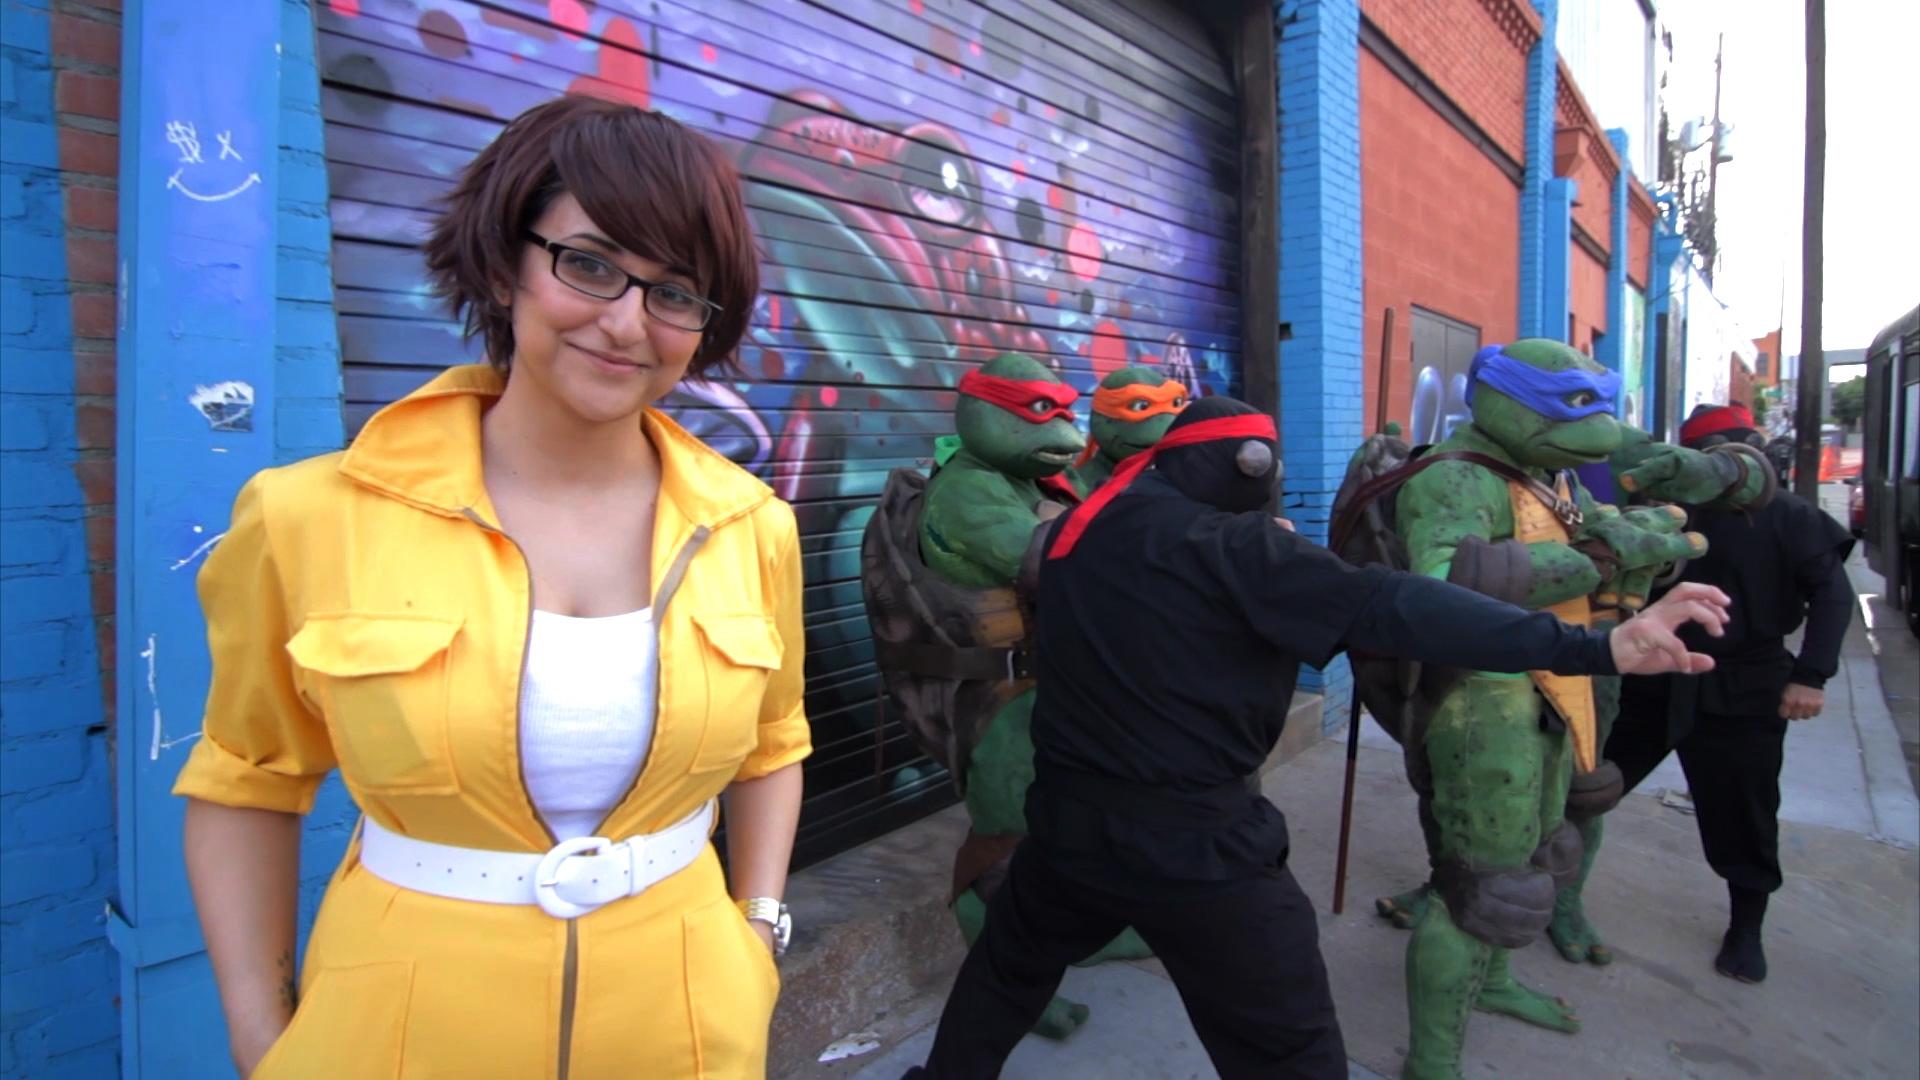 Dallas ComicCon TMNT NINJA RAP Ft. Black Nerd Comedy FINAL_00001